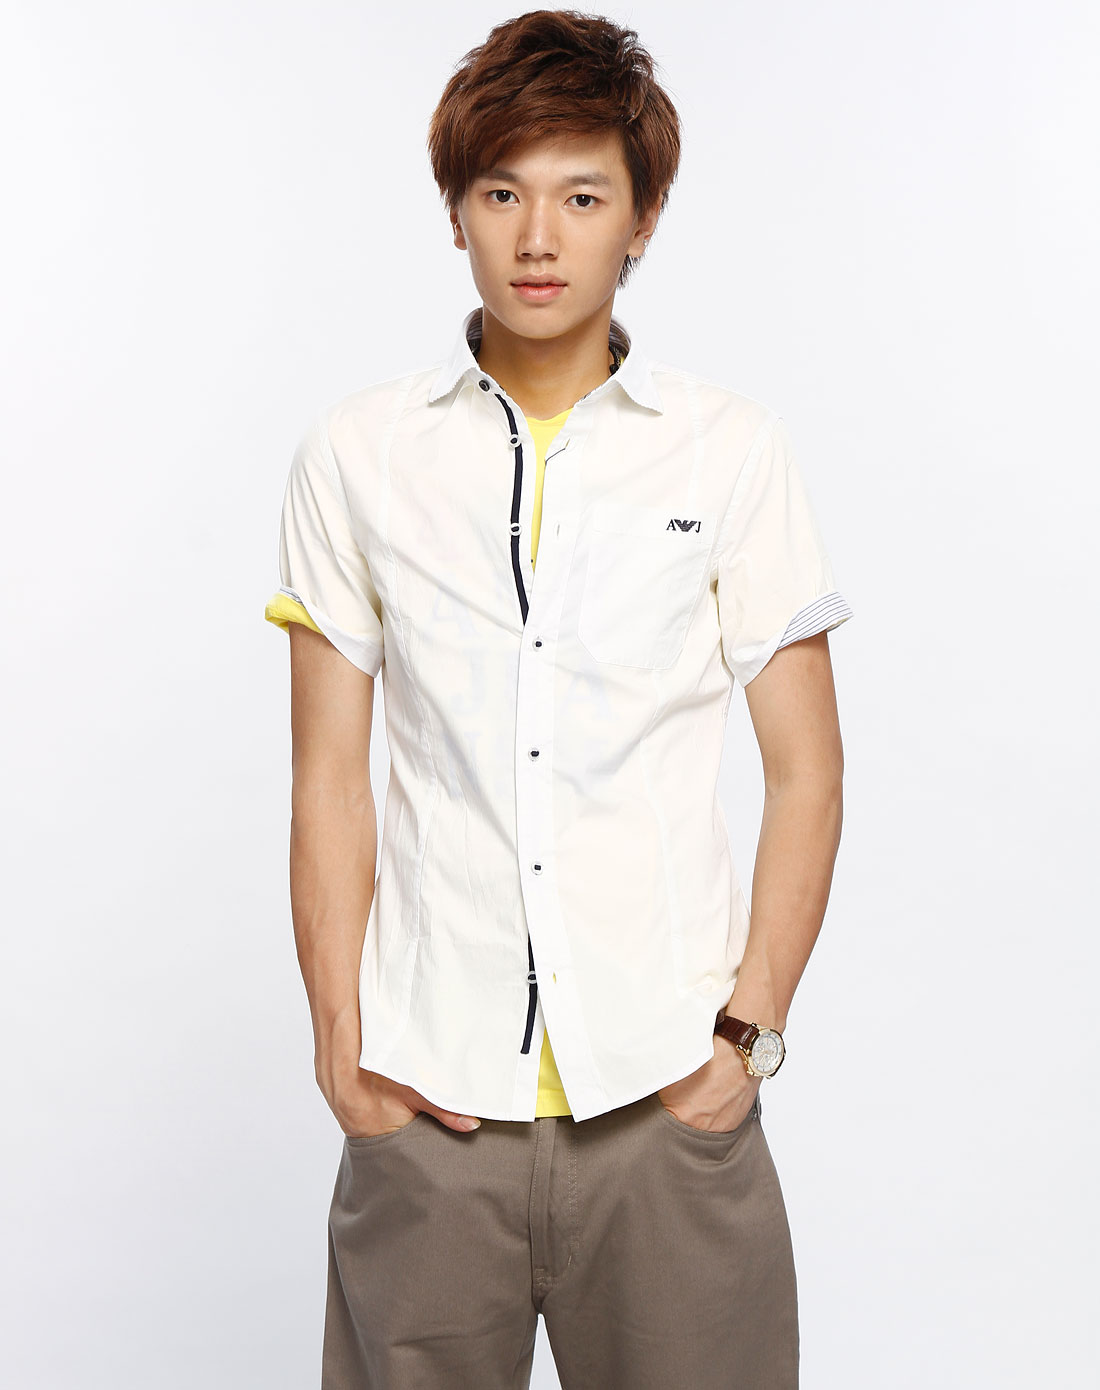 armani aj 男款白色短袖衬衫